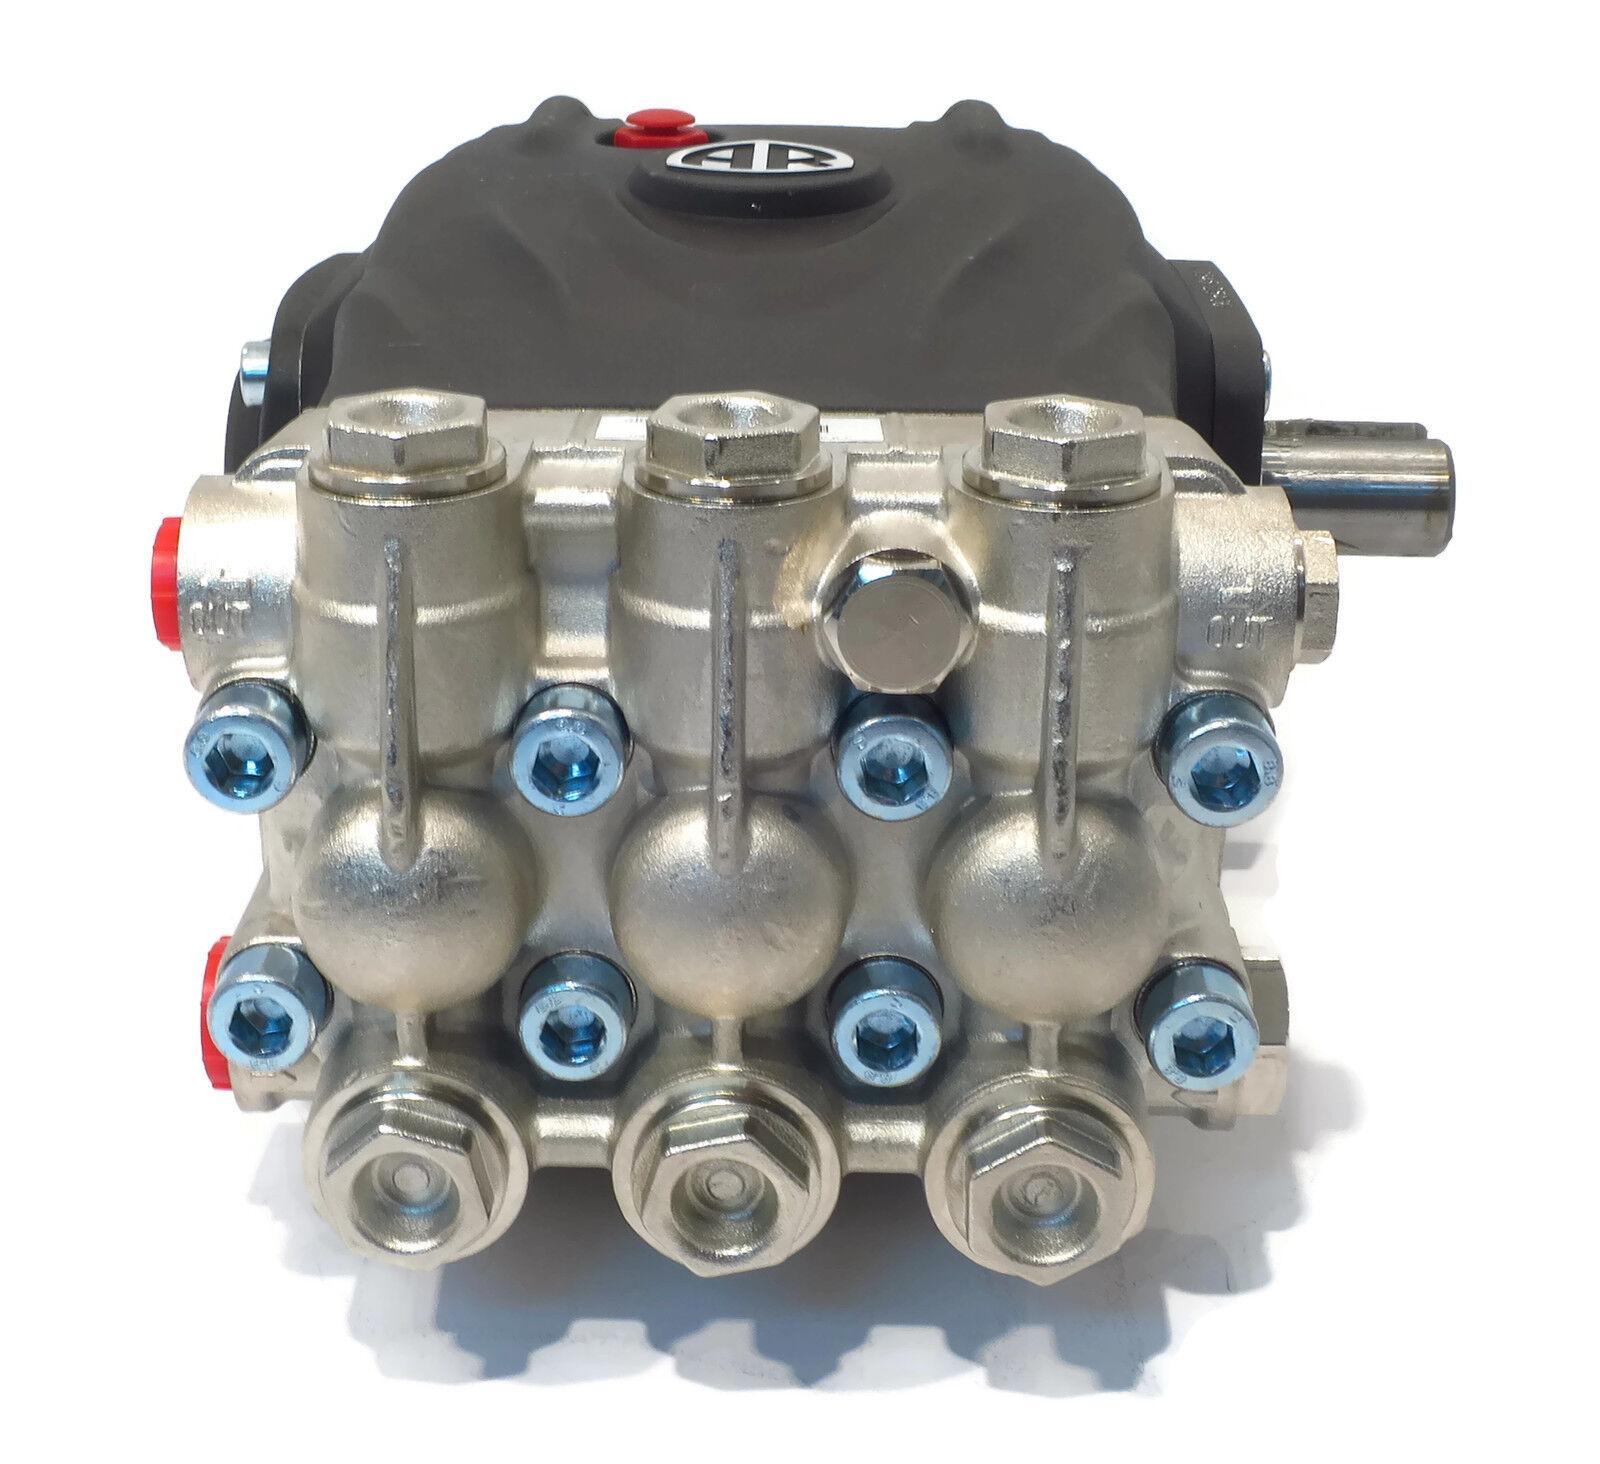 Pressure Washer Pump Replaces Interpump Ws202 3600 Psi